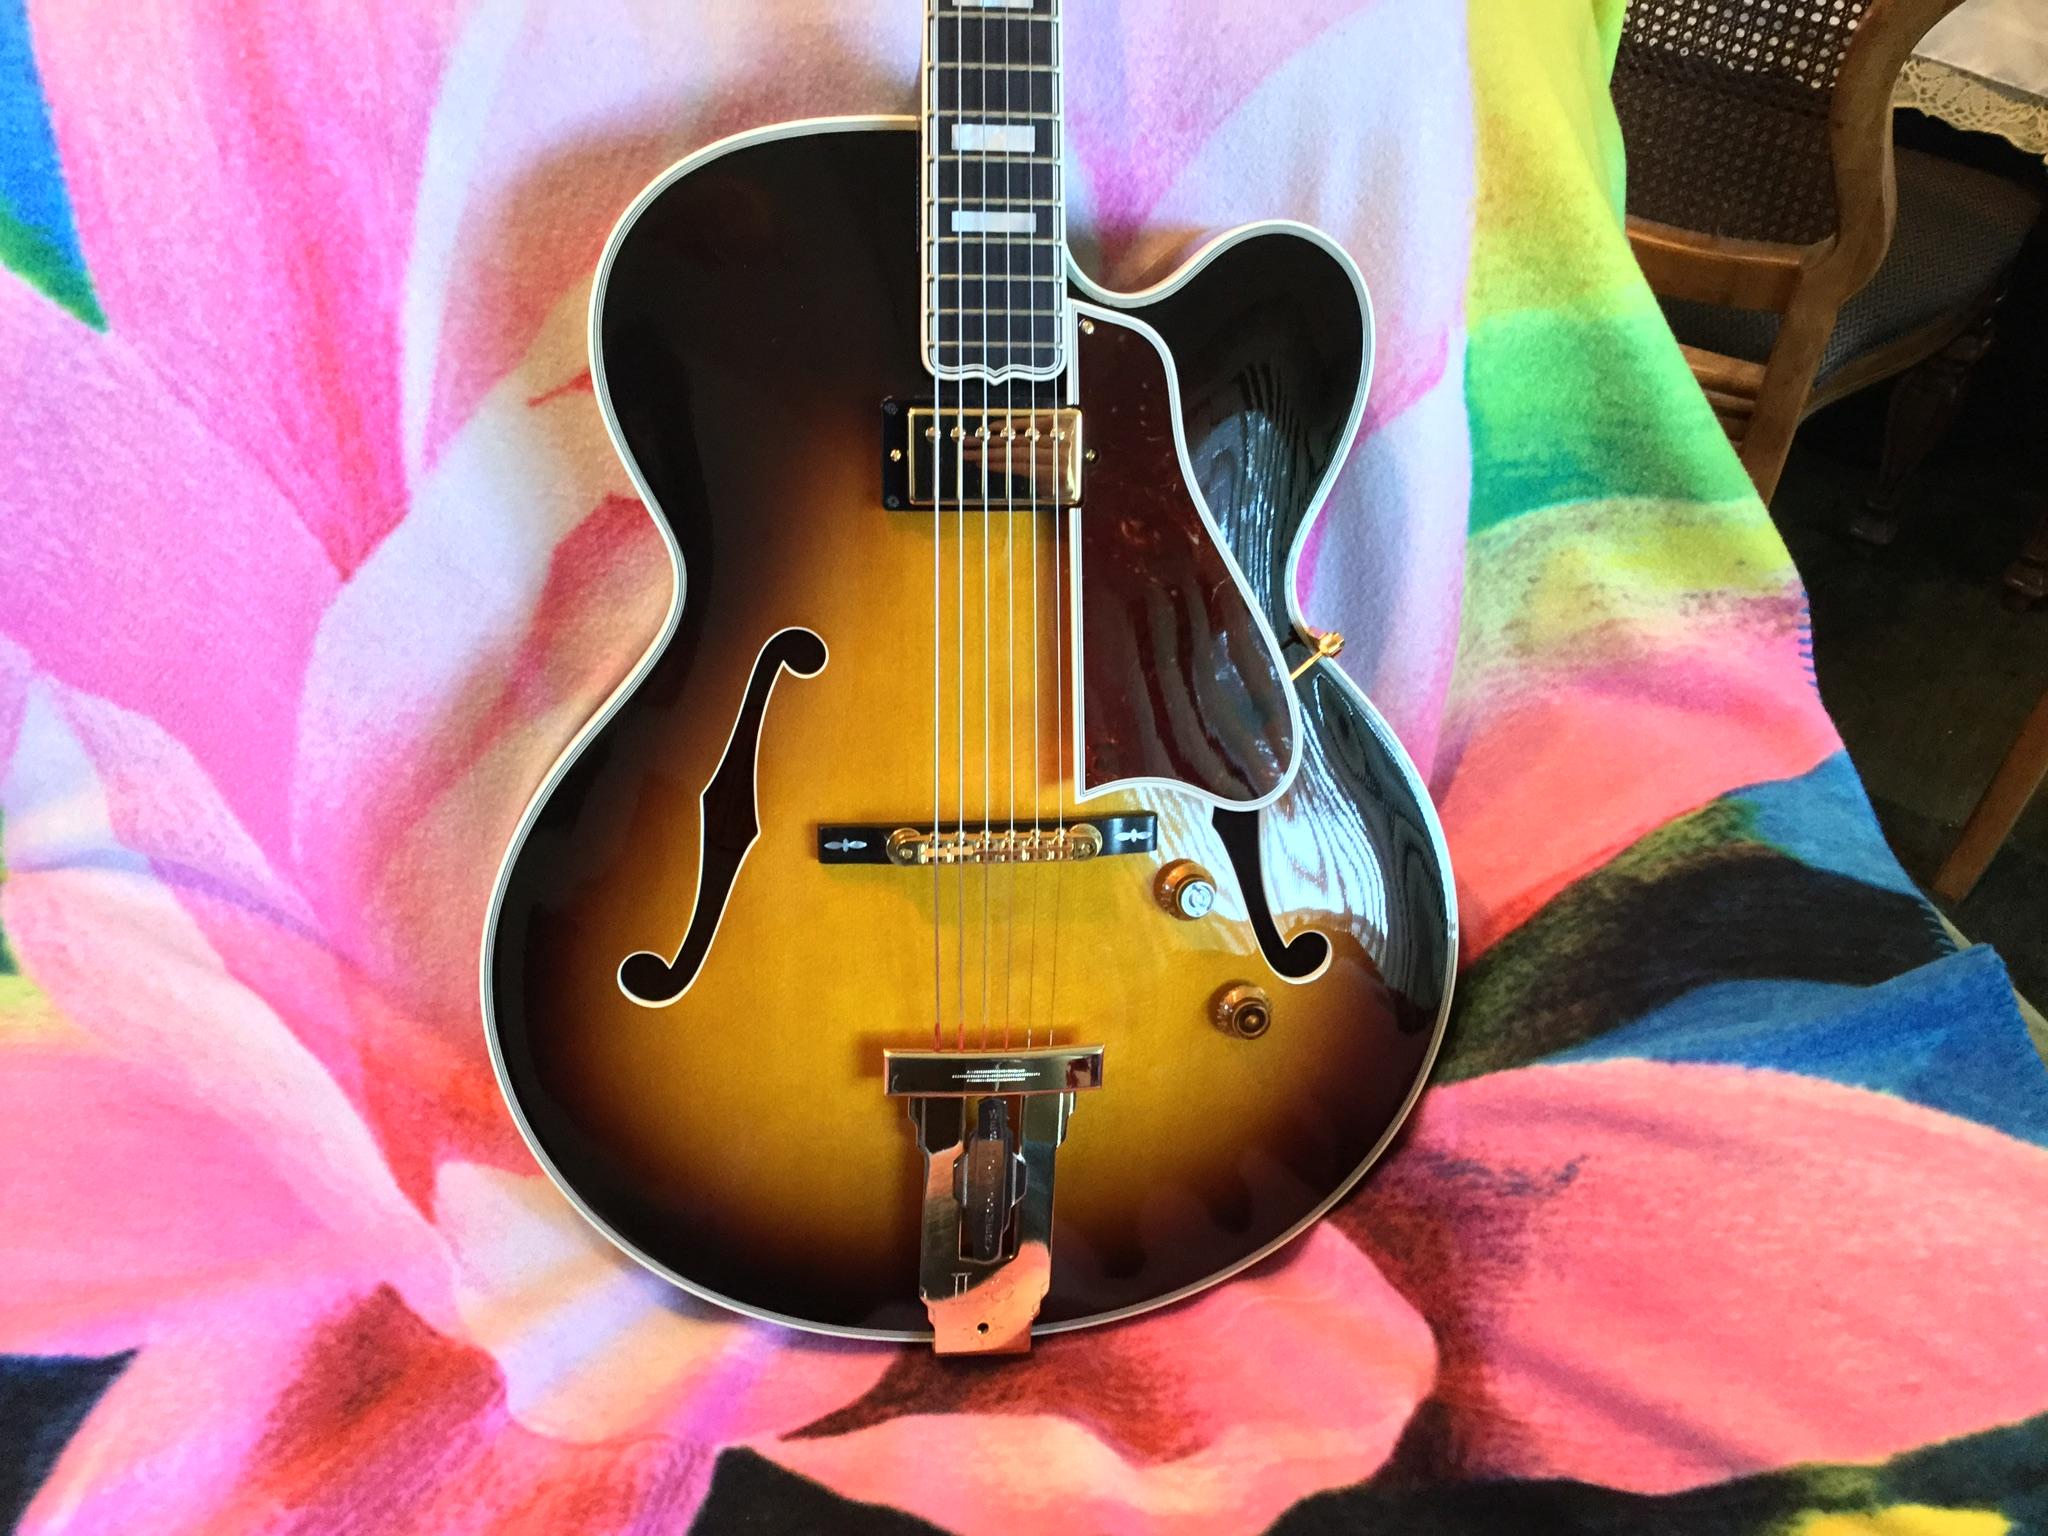 Dream guitar buying issues-202cec8e-ec1c-4969-888c-4f213aec1b2f-jpeg